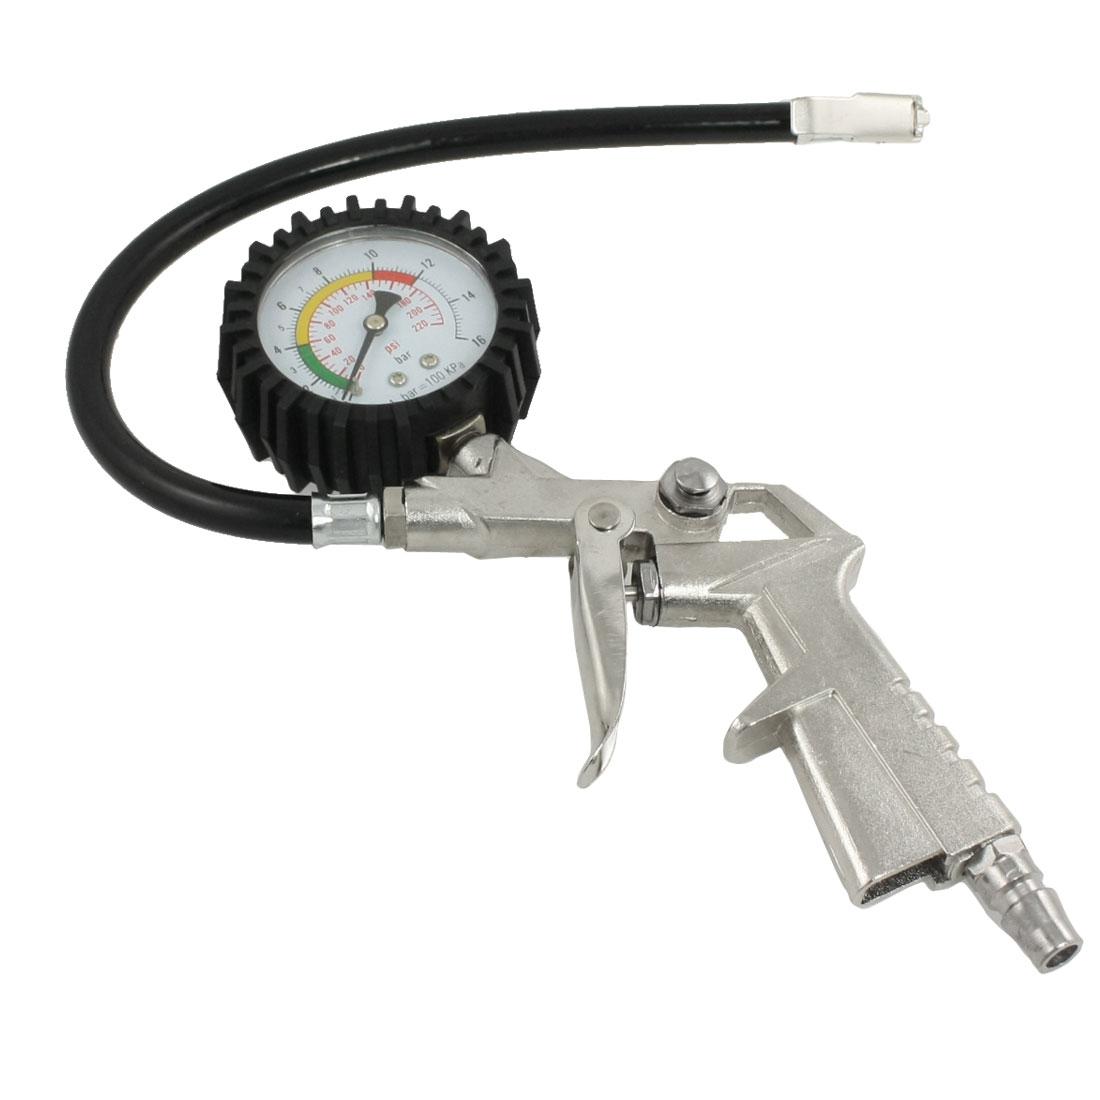 Auto Car Travel Inflating Gun w Tire Air Pressure Gauge Black